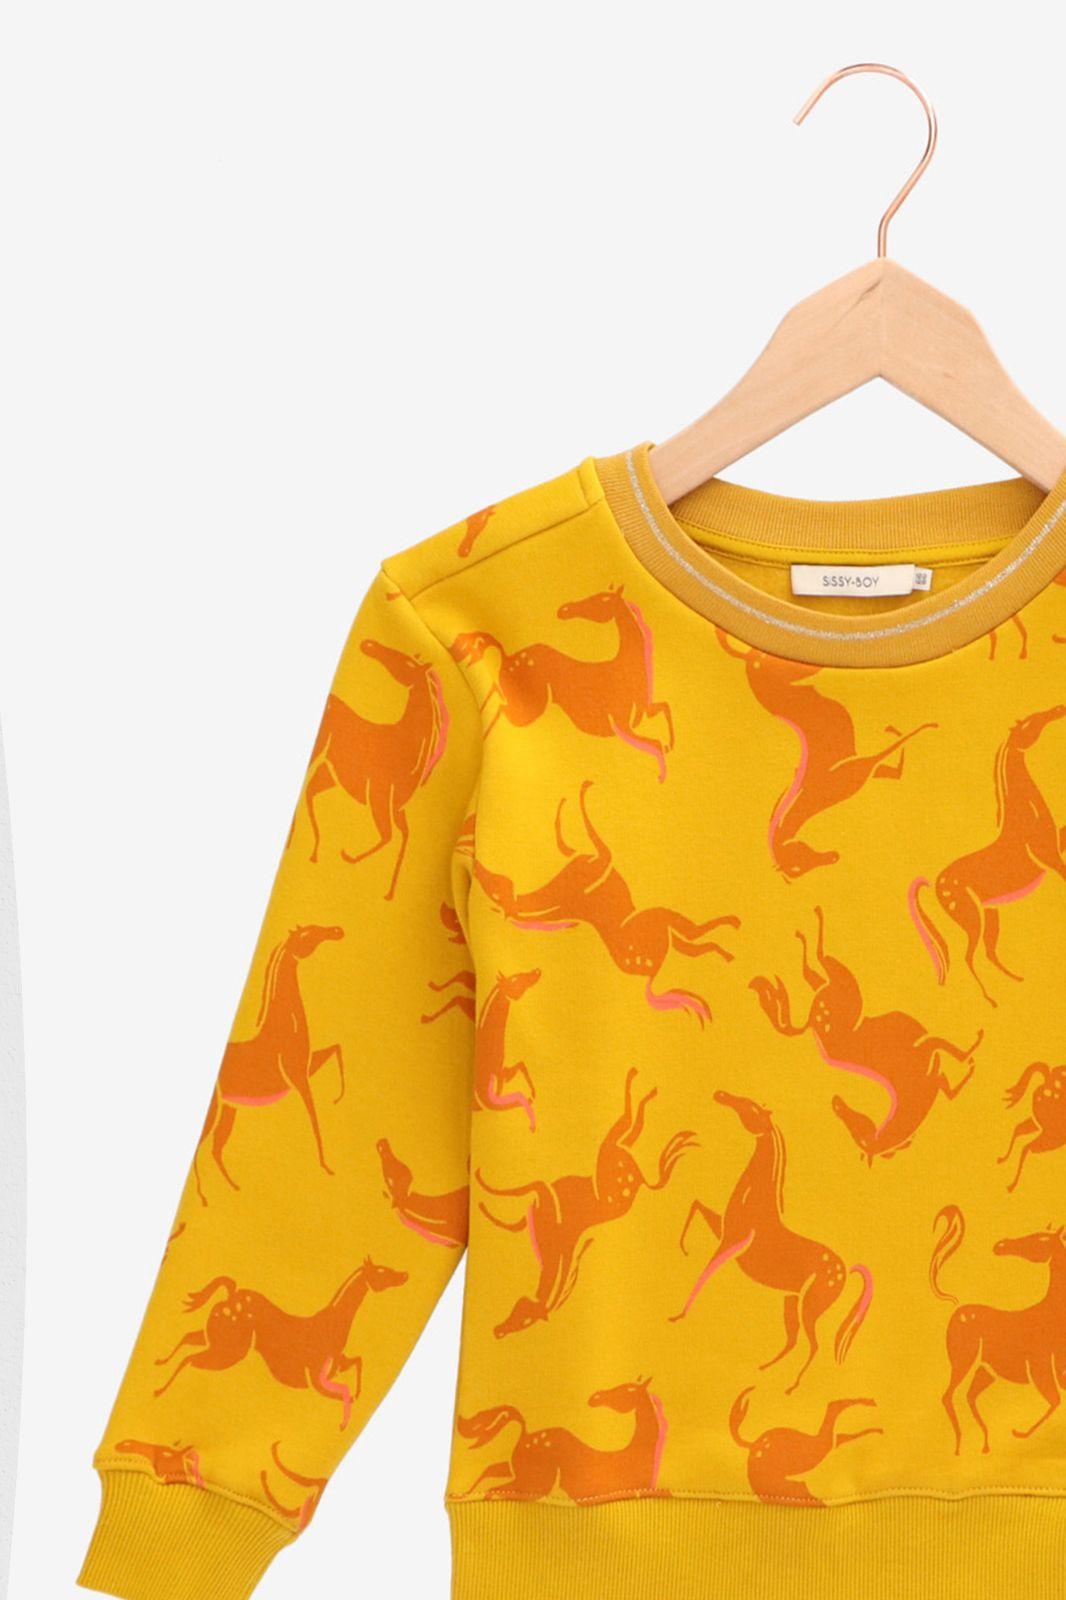 Gele sweater met paardenprint